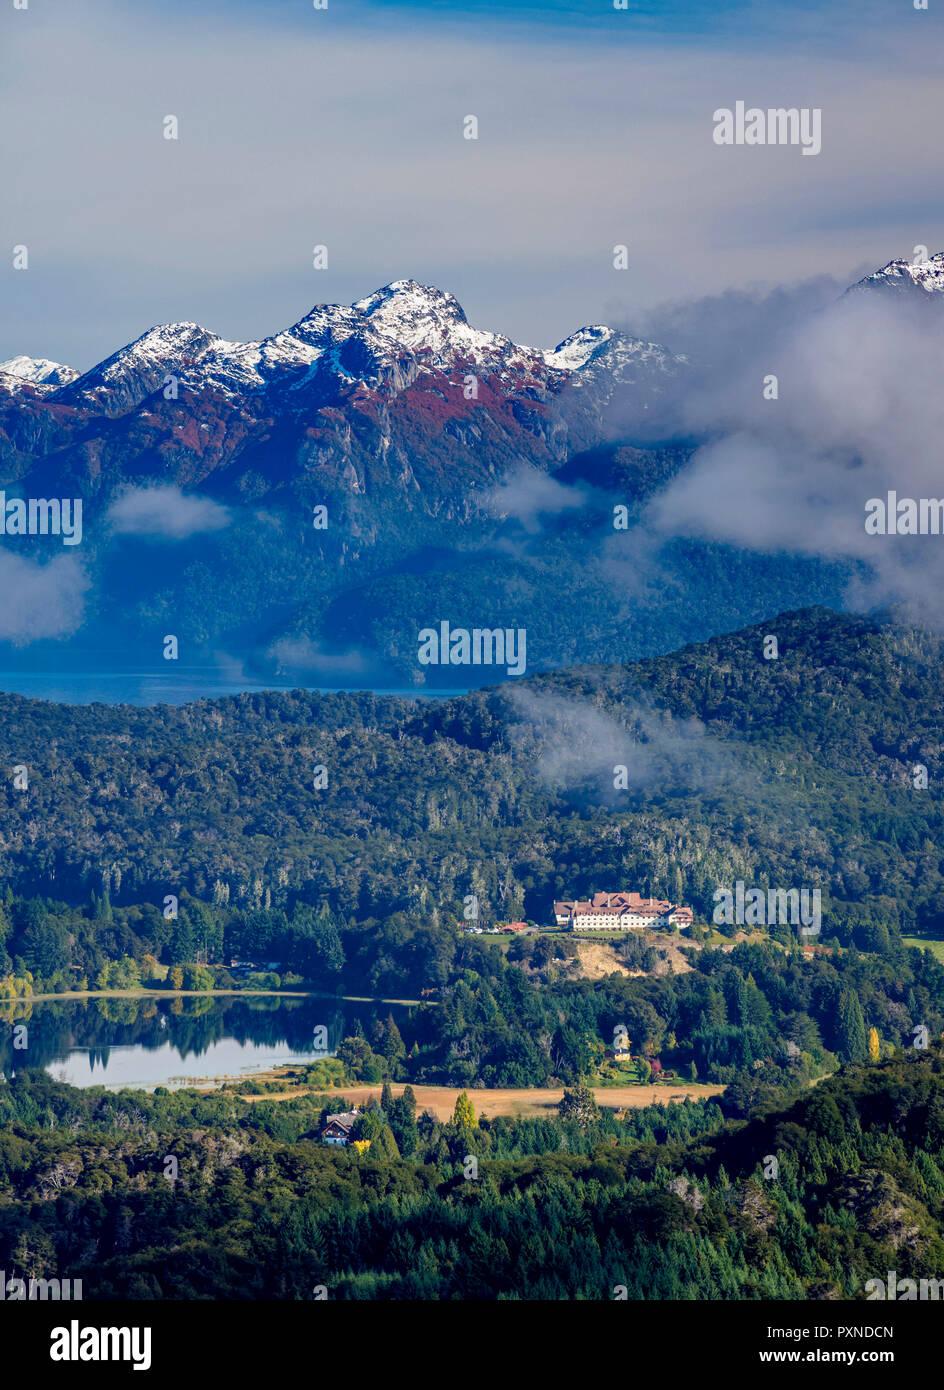 Perito Moreno Lake and Llao Llao Hotel seen from Cerro Campanario, Nahuel Huapi National Park, Rio Negro Province, Argentina - Stock Image